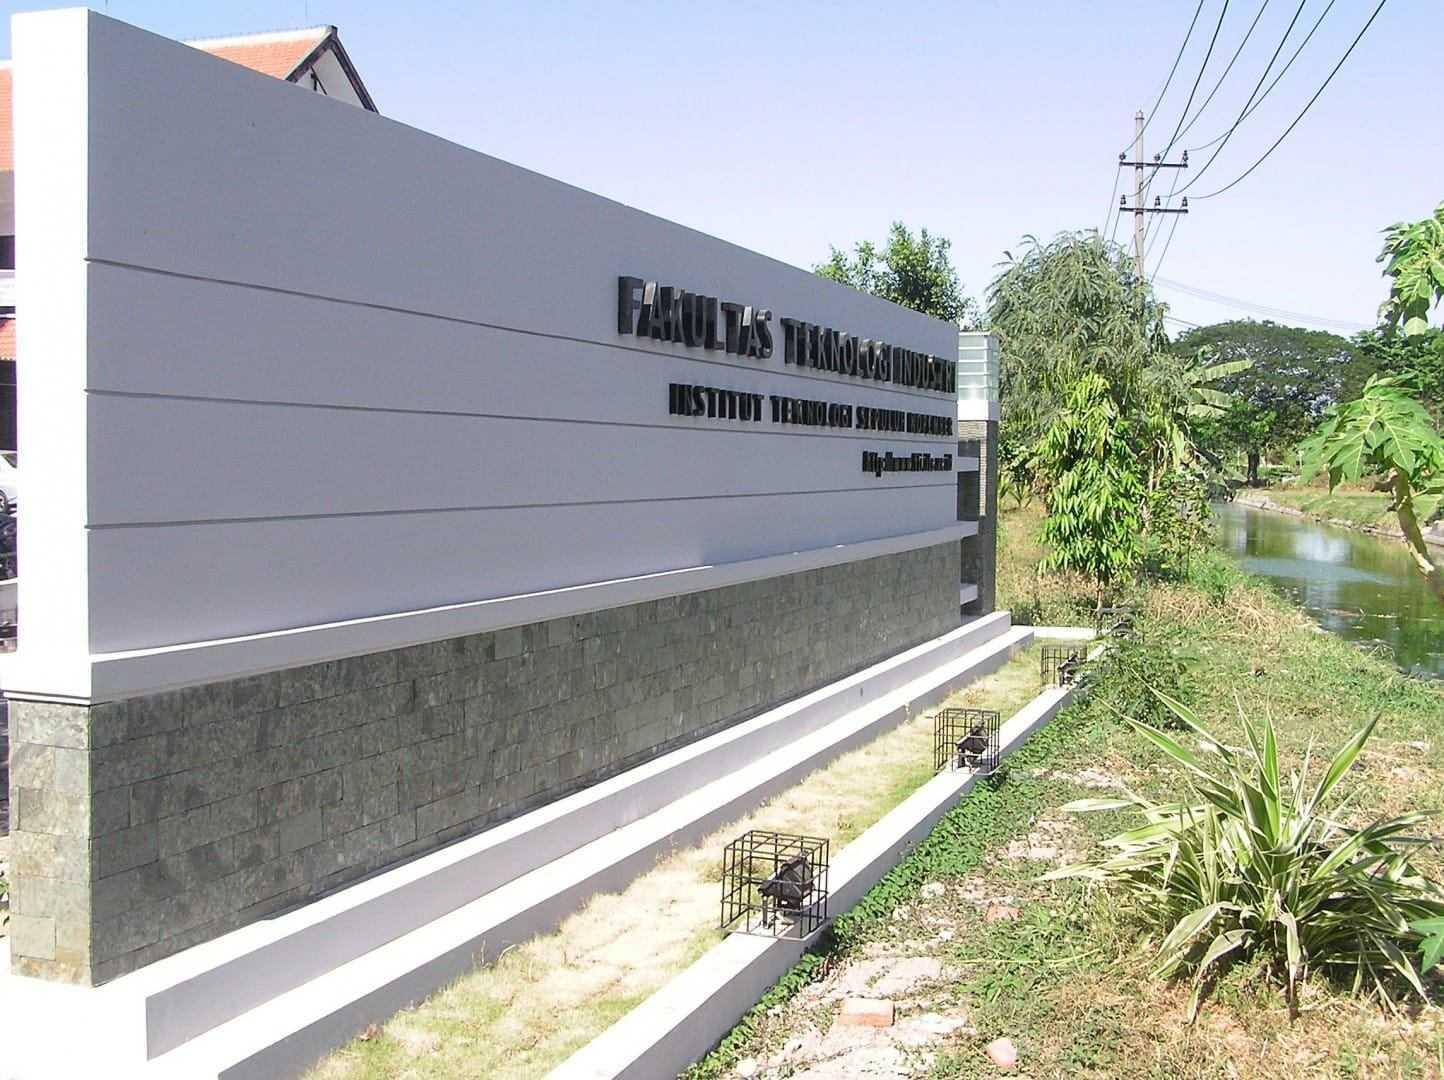 Ega Cipta Pratama Its Surabaya Surabaya, Kota Sby, Jawa Timur, Indonesia Surabaya, Kota Sby, Jawa Timur, Indonesia Ega-Cipta-Pratama-Gerbang-Fakultas-Teknologi-Industri-Its Modern 55356